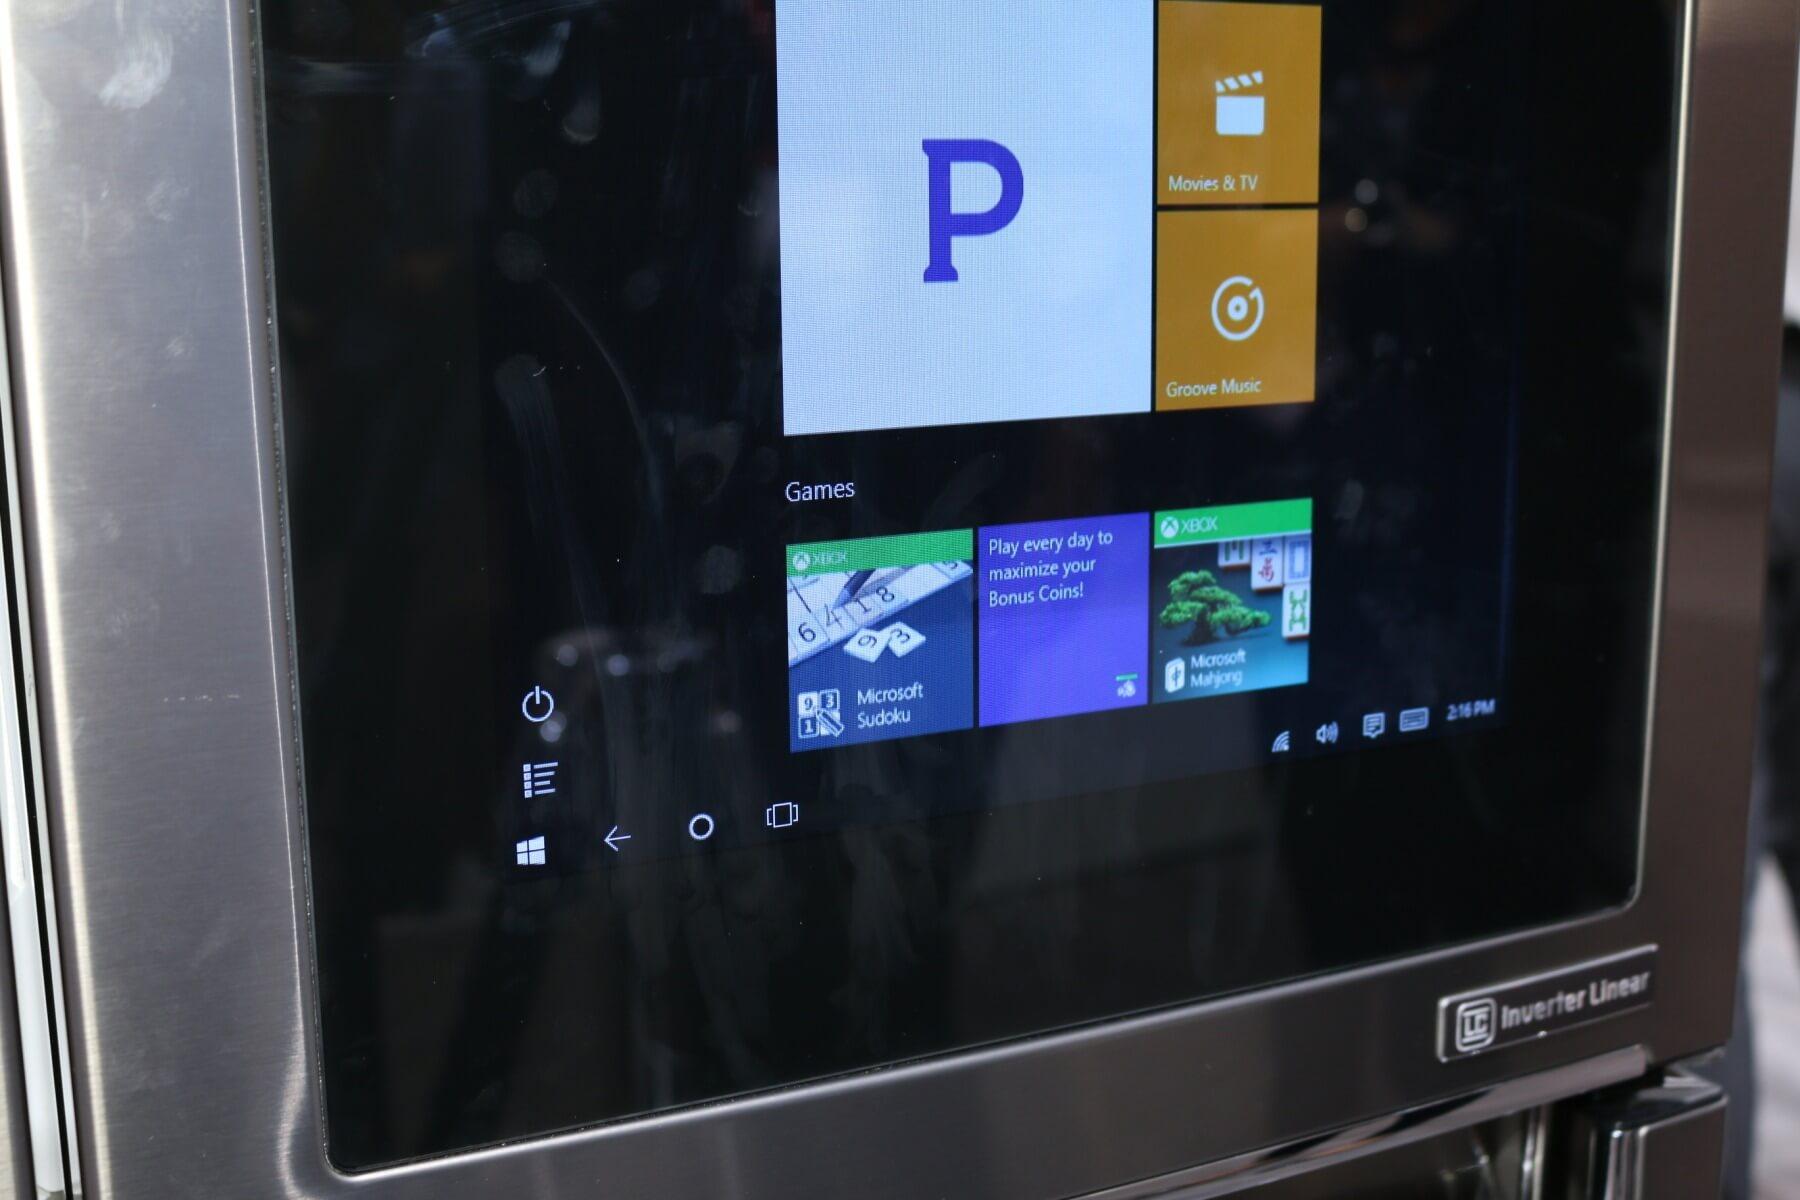 LG IFA-Highlights: Windows-10-Kühlschrank im Hands-on